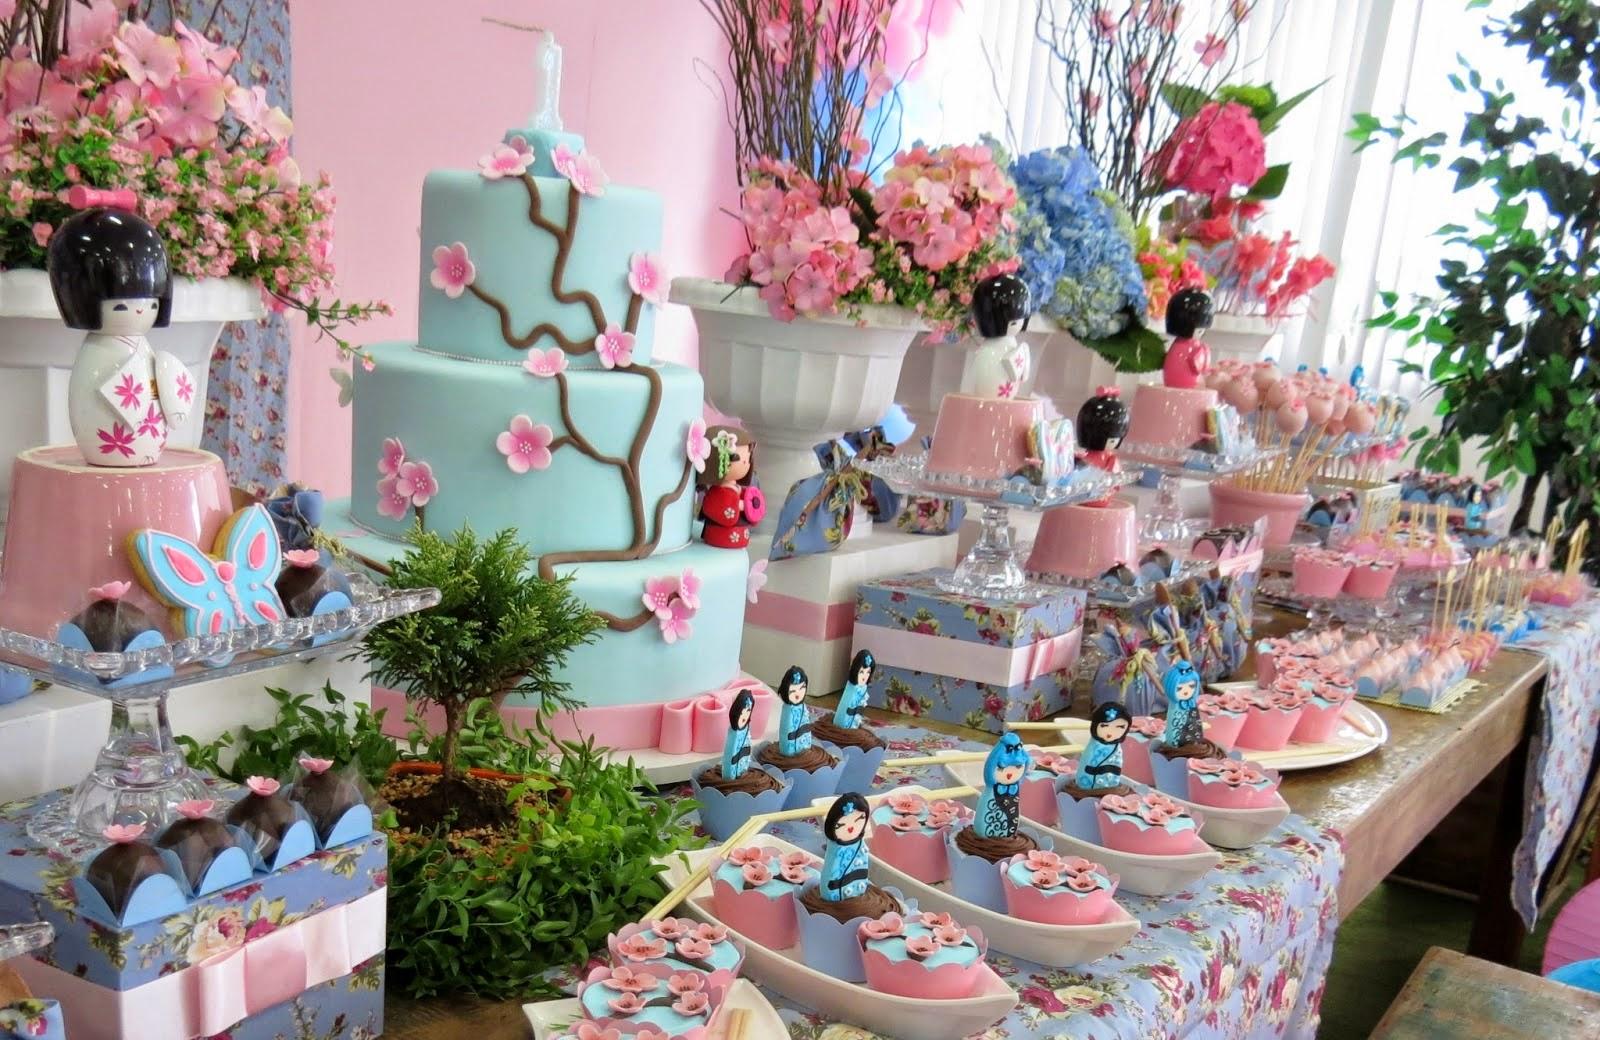 festa jardim vintage:Enviar por e-mail BlogThis! Compartilhar no Twitter Compartilhar no